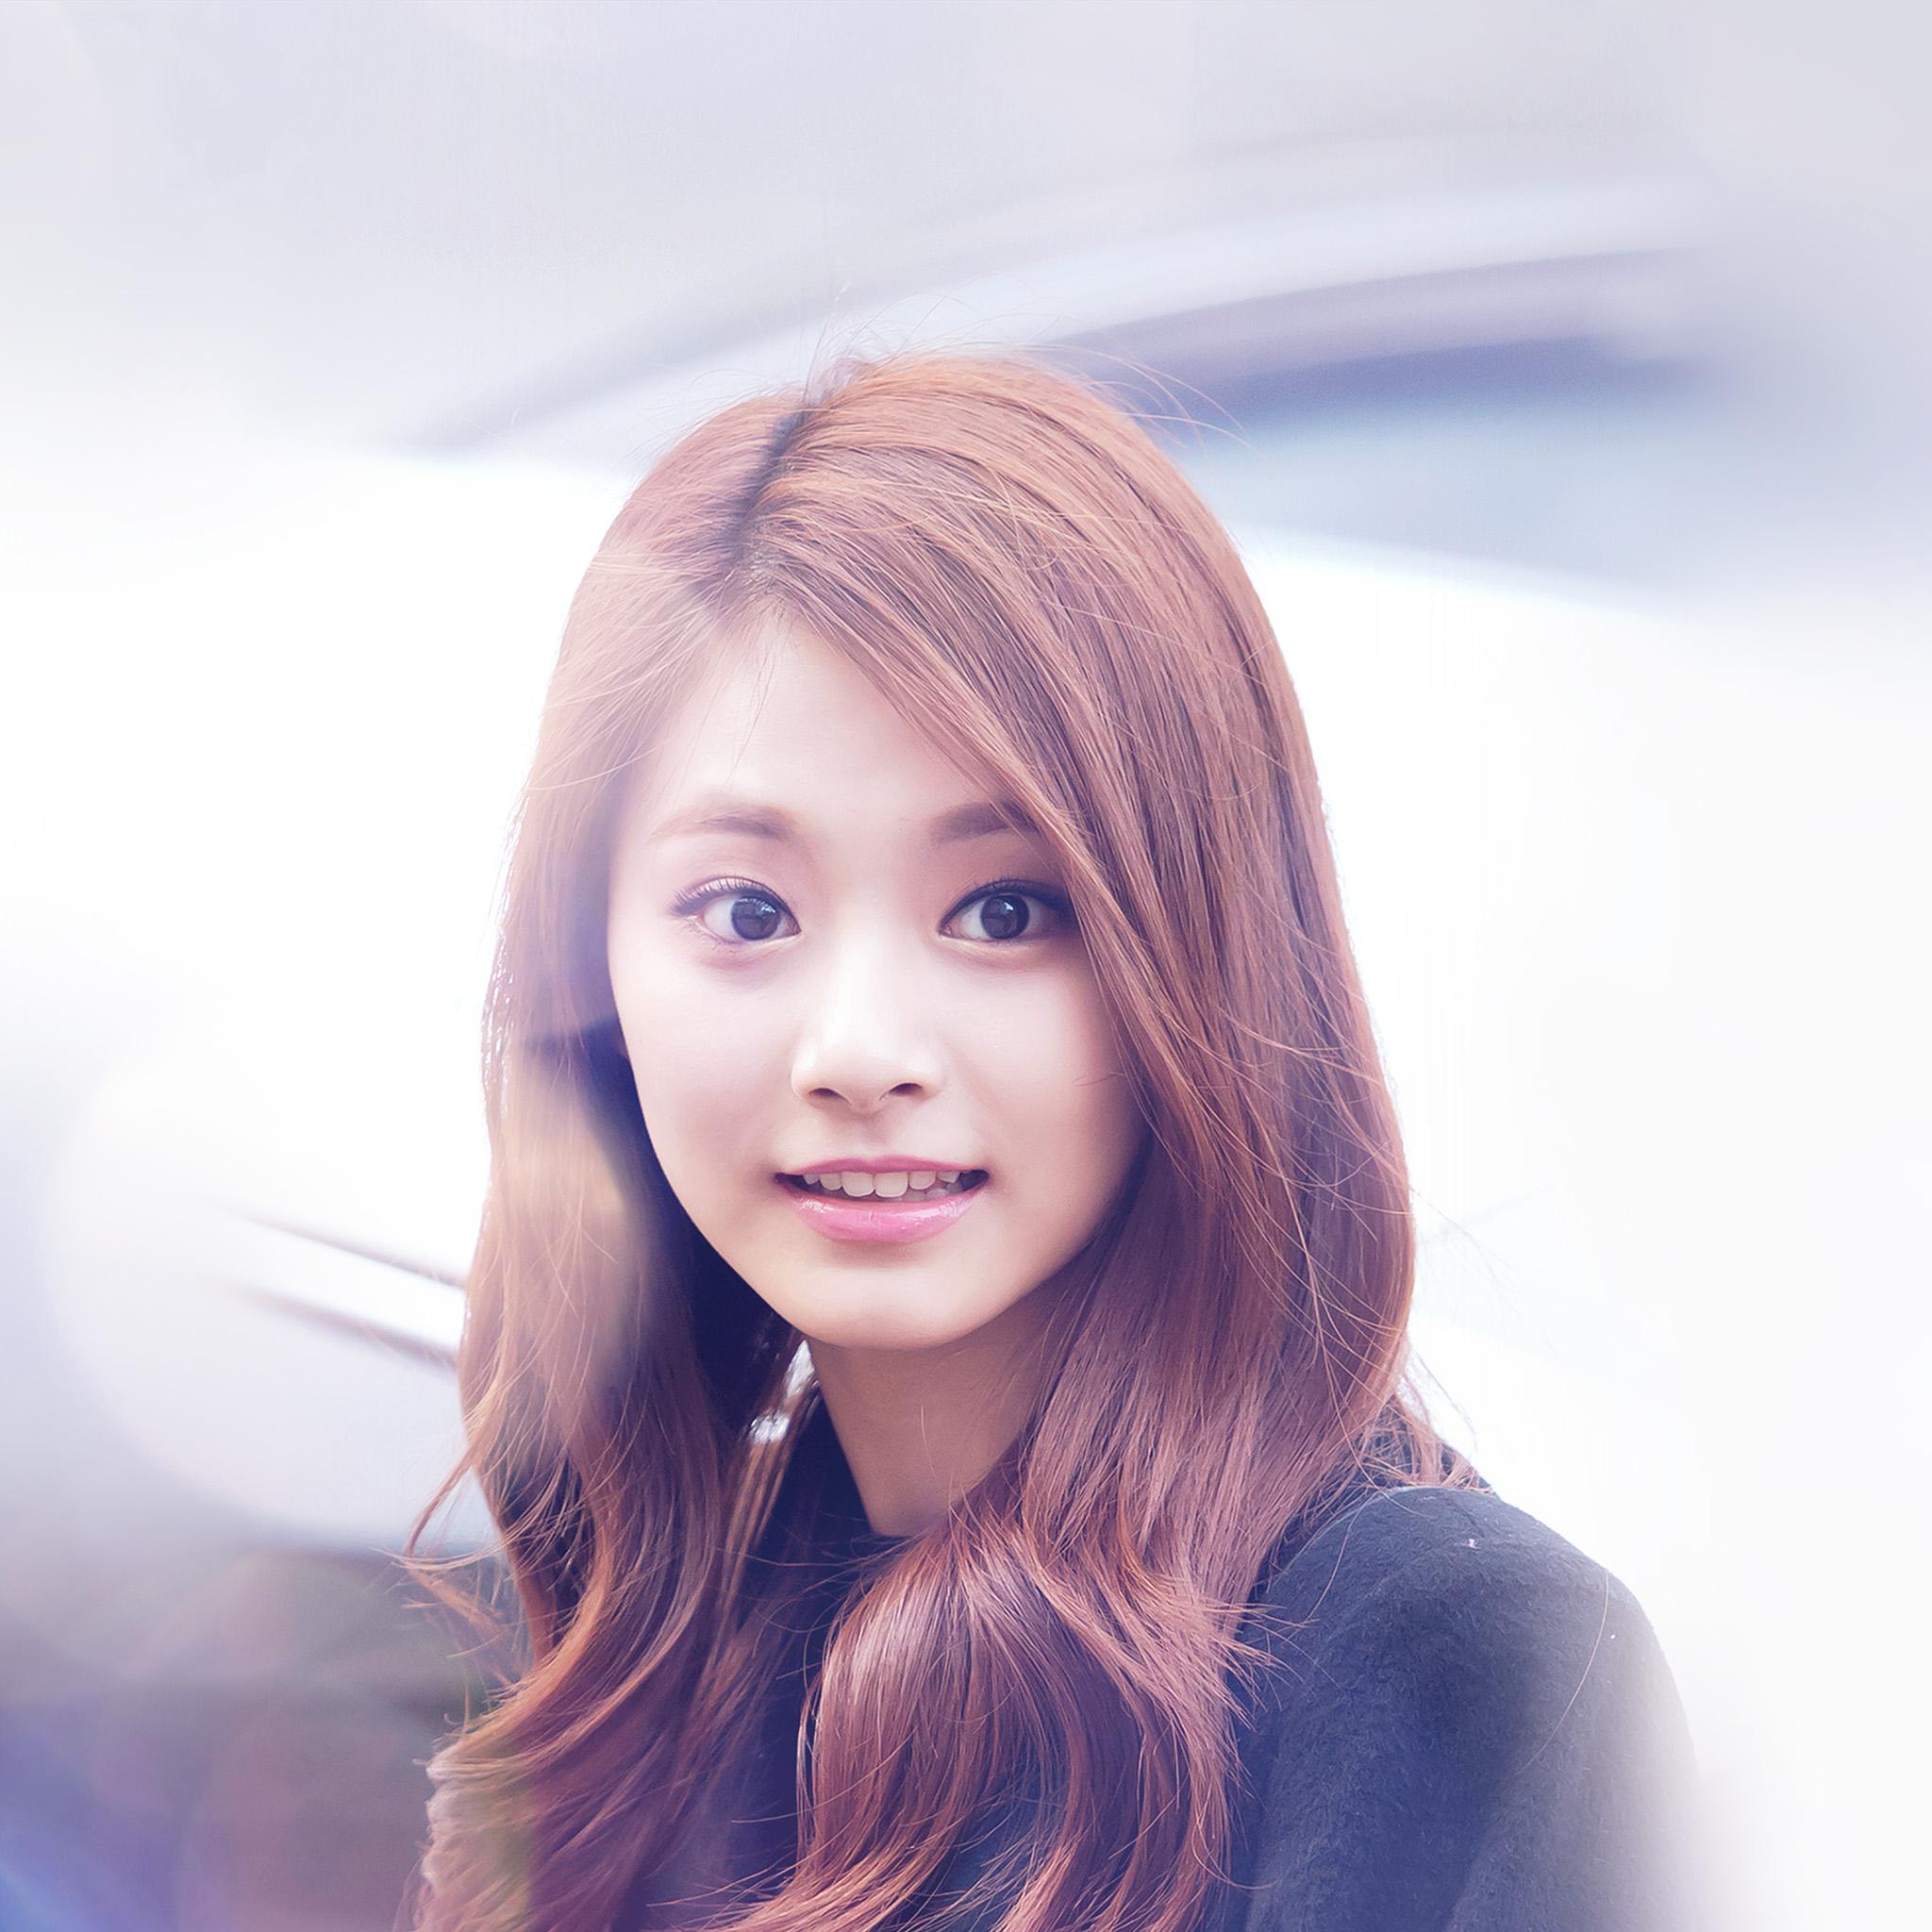 Hh33 Tzuyu Twice Smile Cute Kpop Jyp Flare Wallpaper